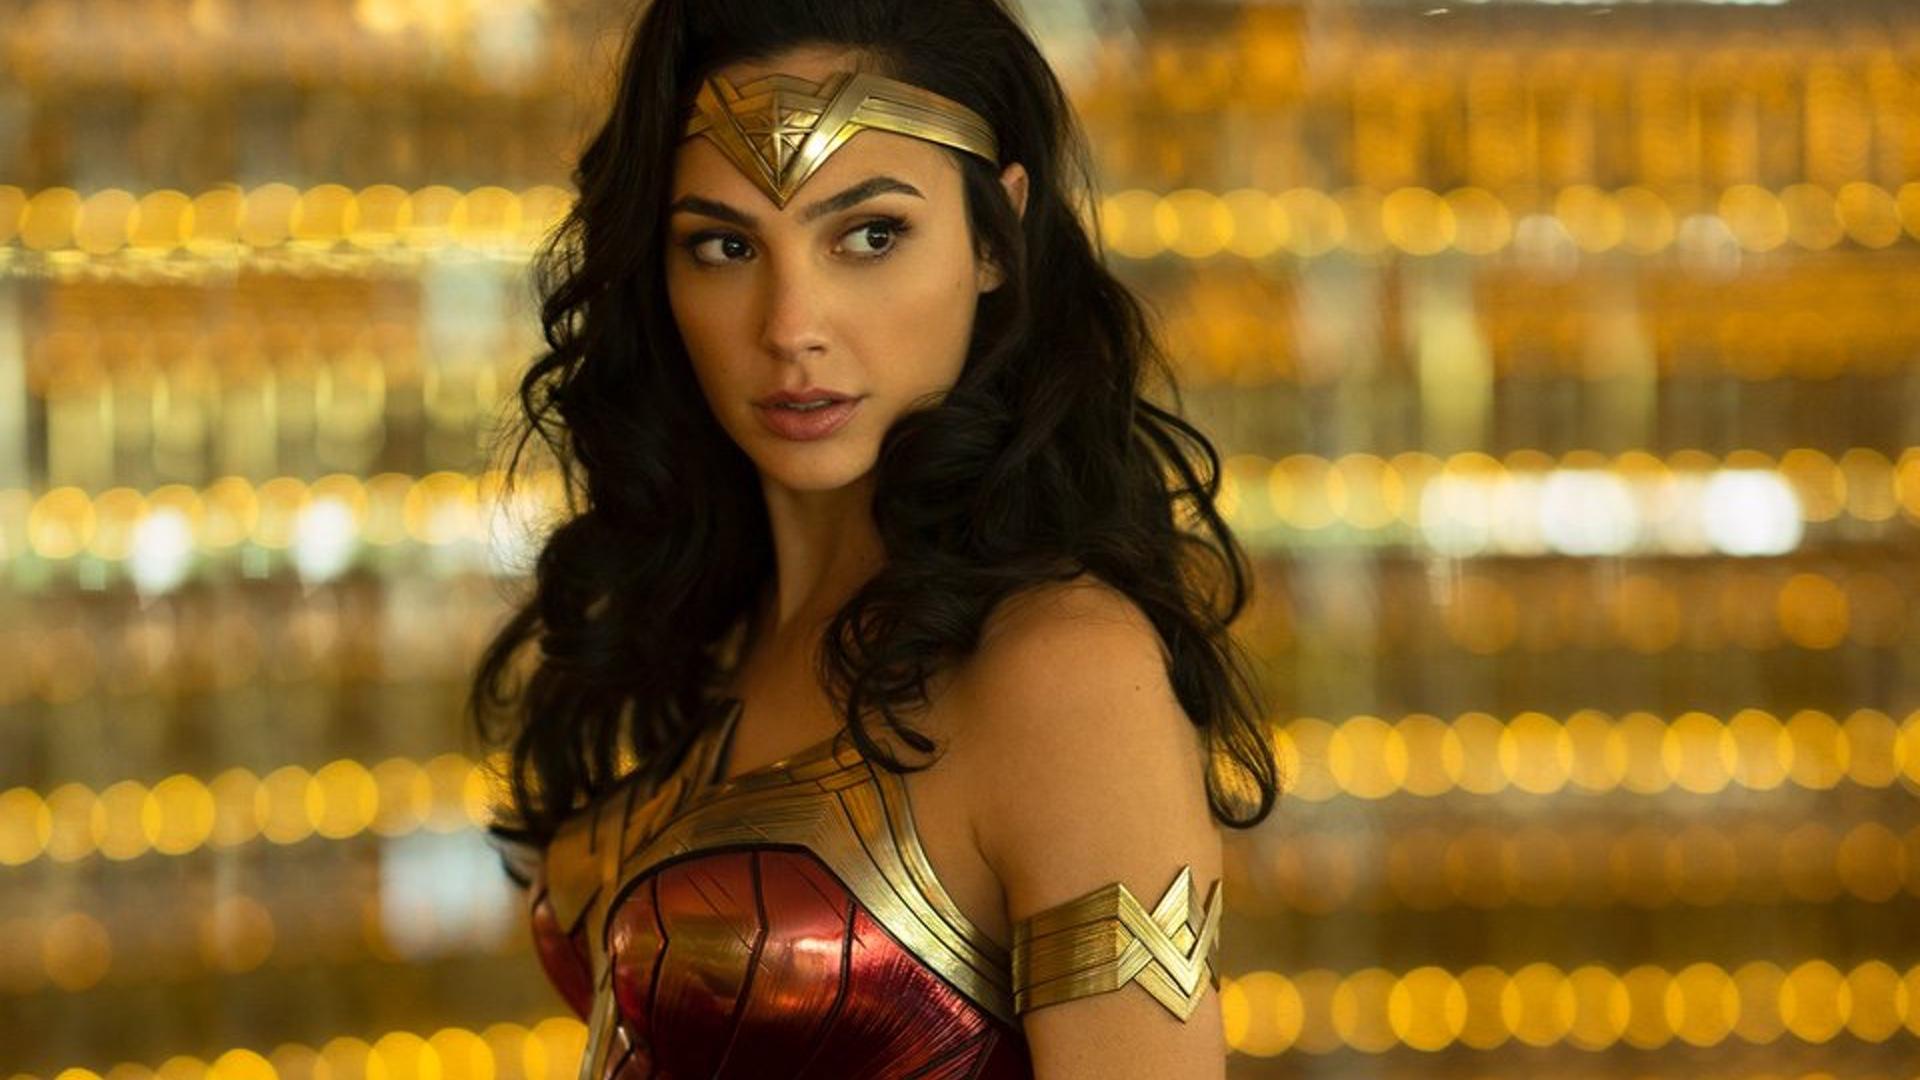 Prima foto di Kristen Wiig in Wonder Woman 1984